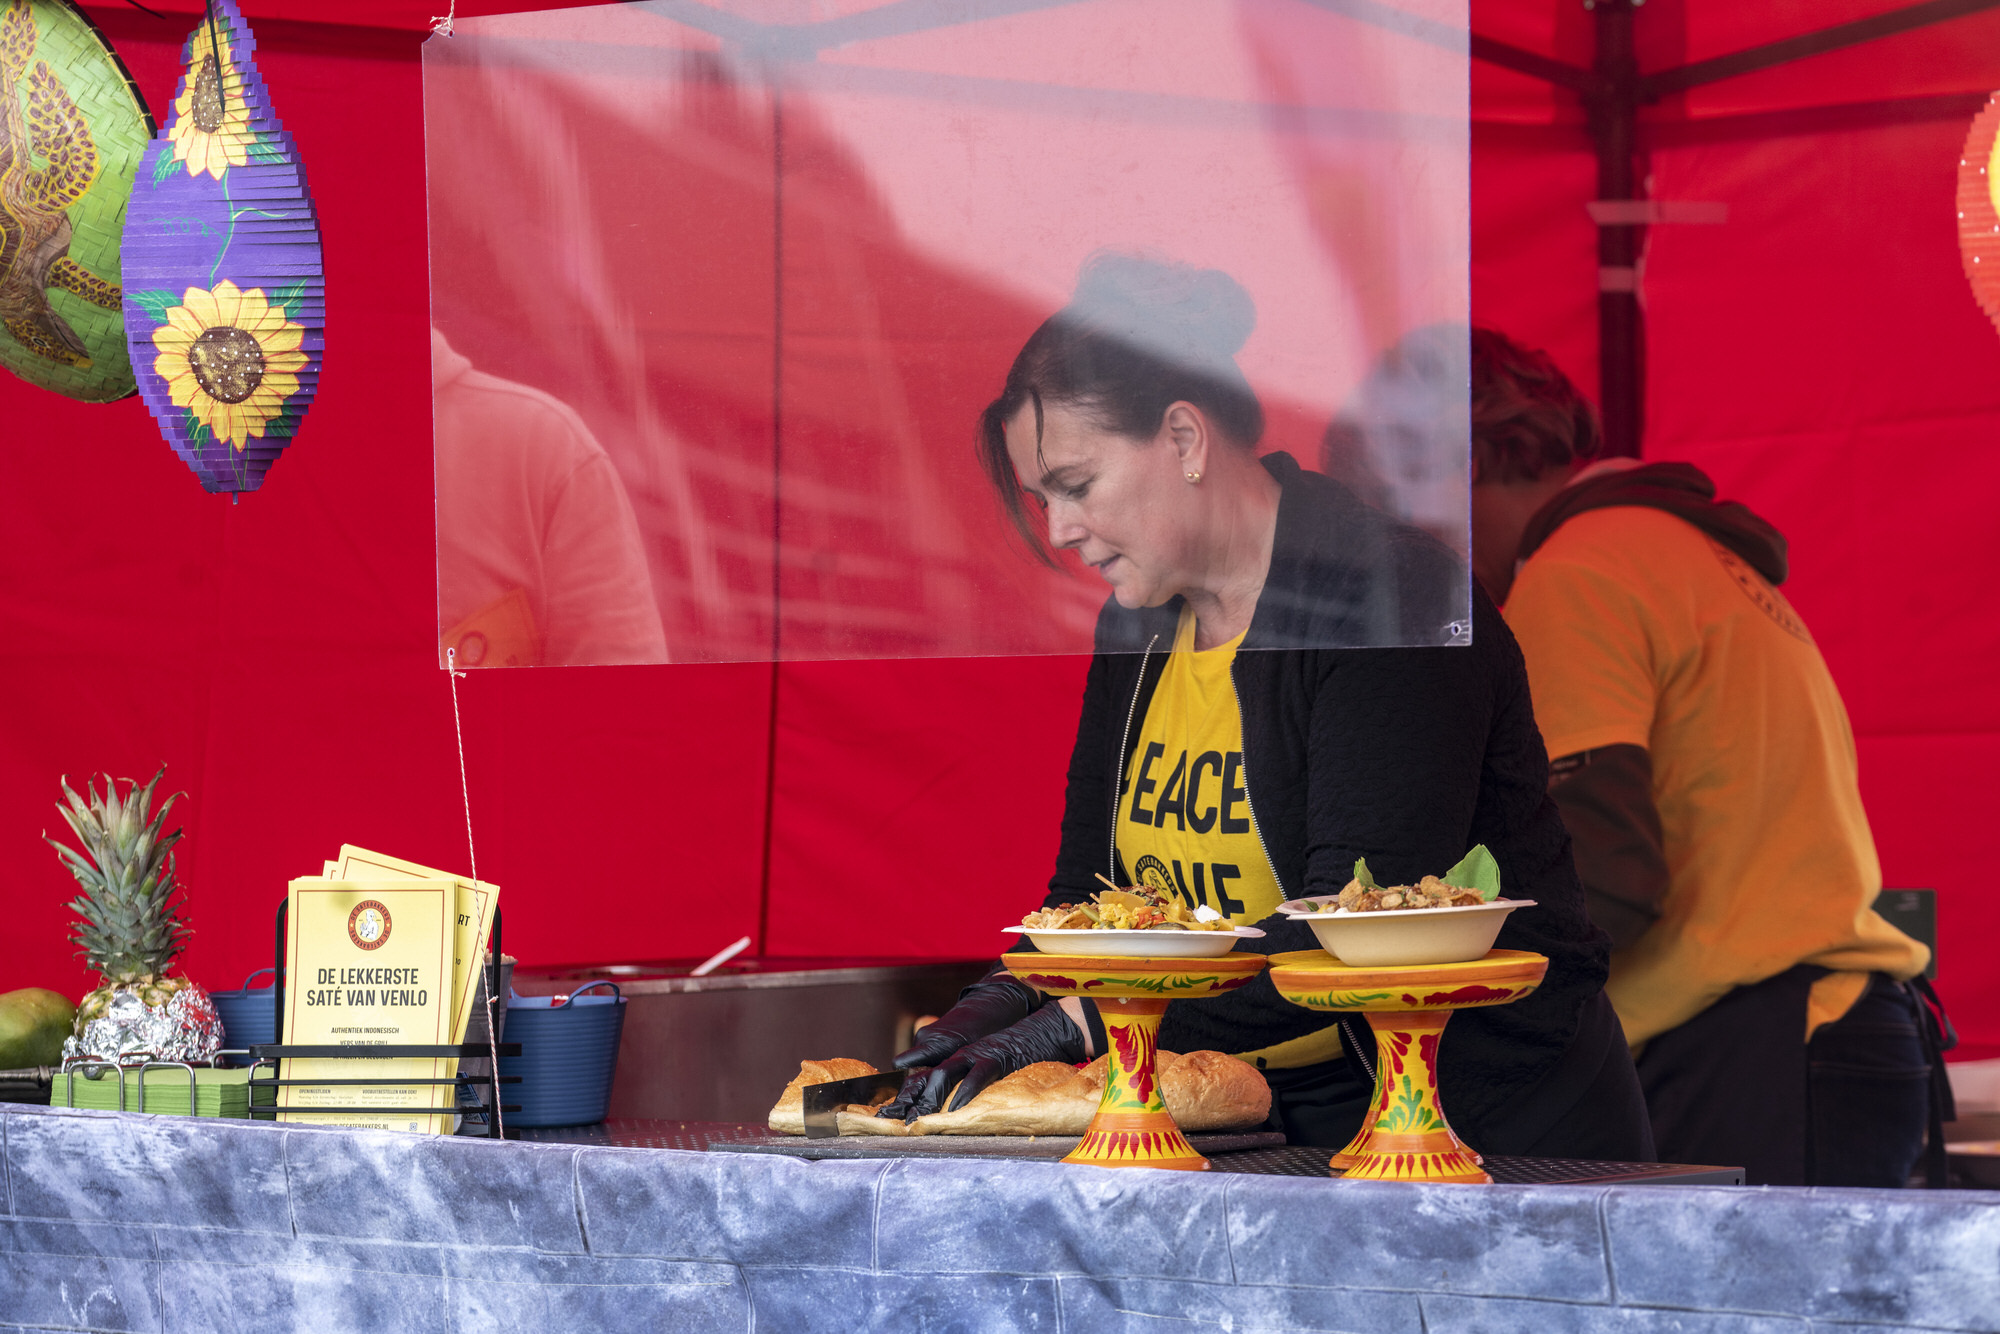 SPIJS-foodfestival-5juni21-00058.jpg